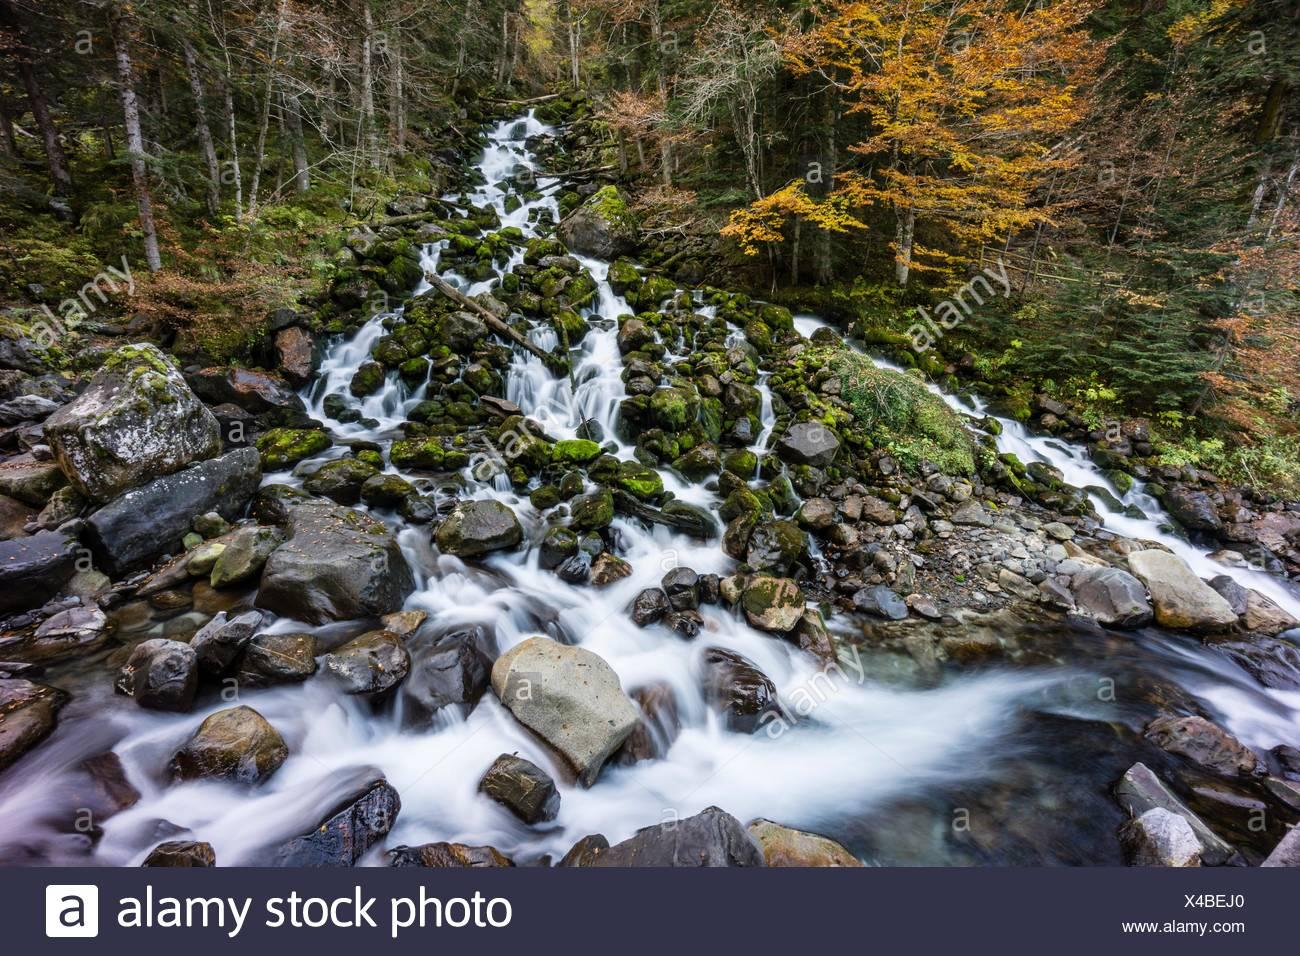 River Joèu sources, Uelhs deth Joèu, Artiga de Lin, Val d´Aran, Lleida province, Pyrenees mountains, Catalonia, Spain - Stock Image